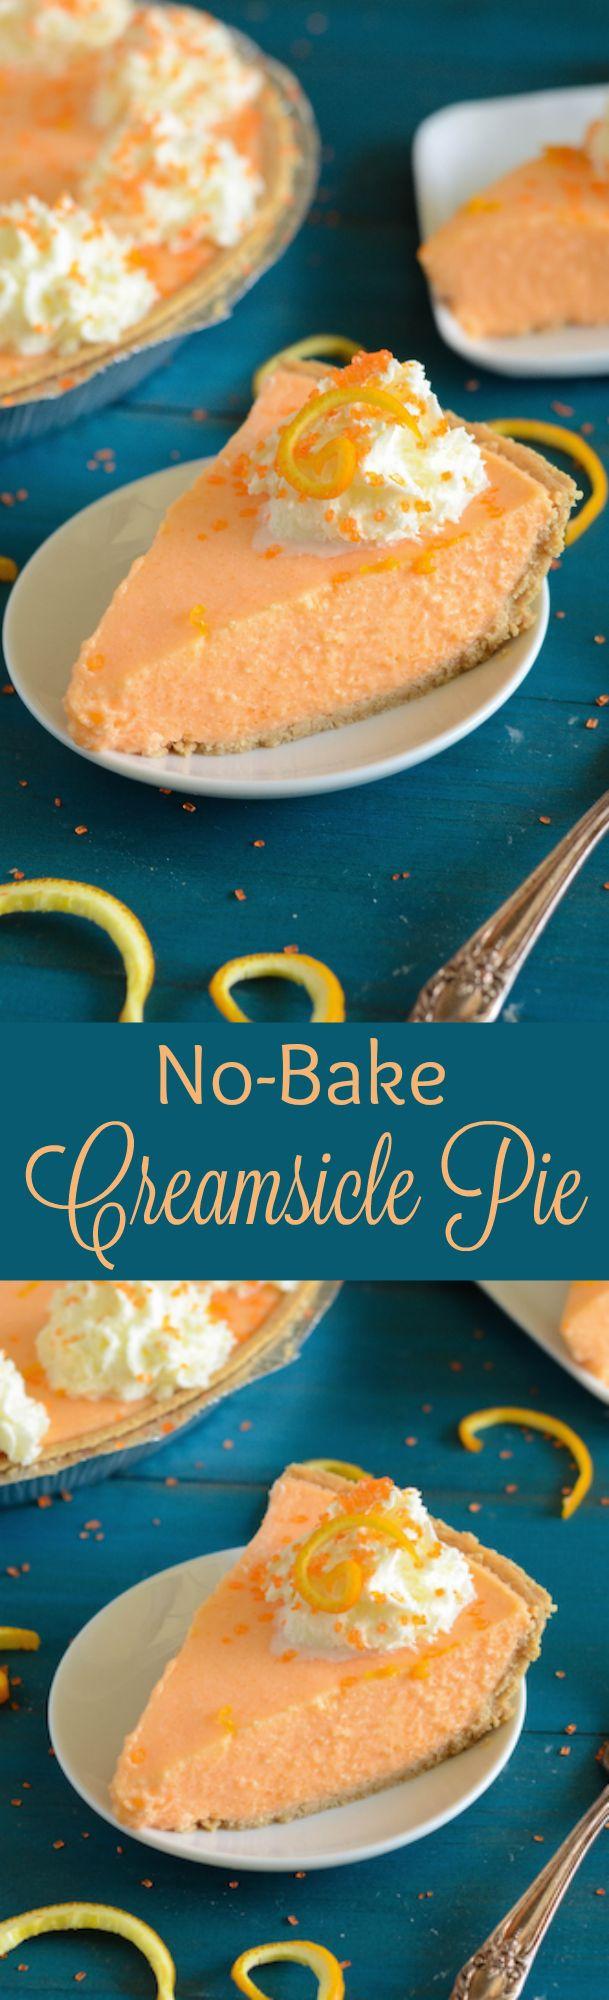 No-Bake Creamsicle Pie!